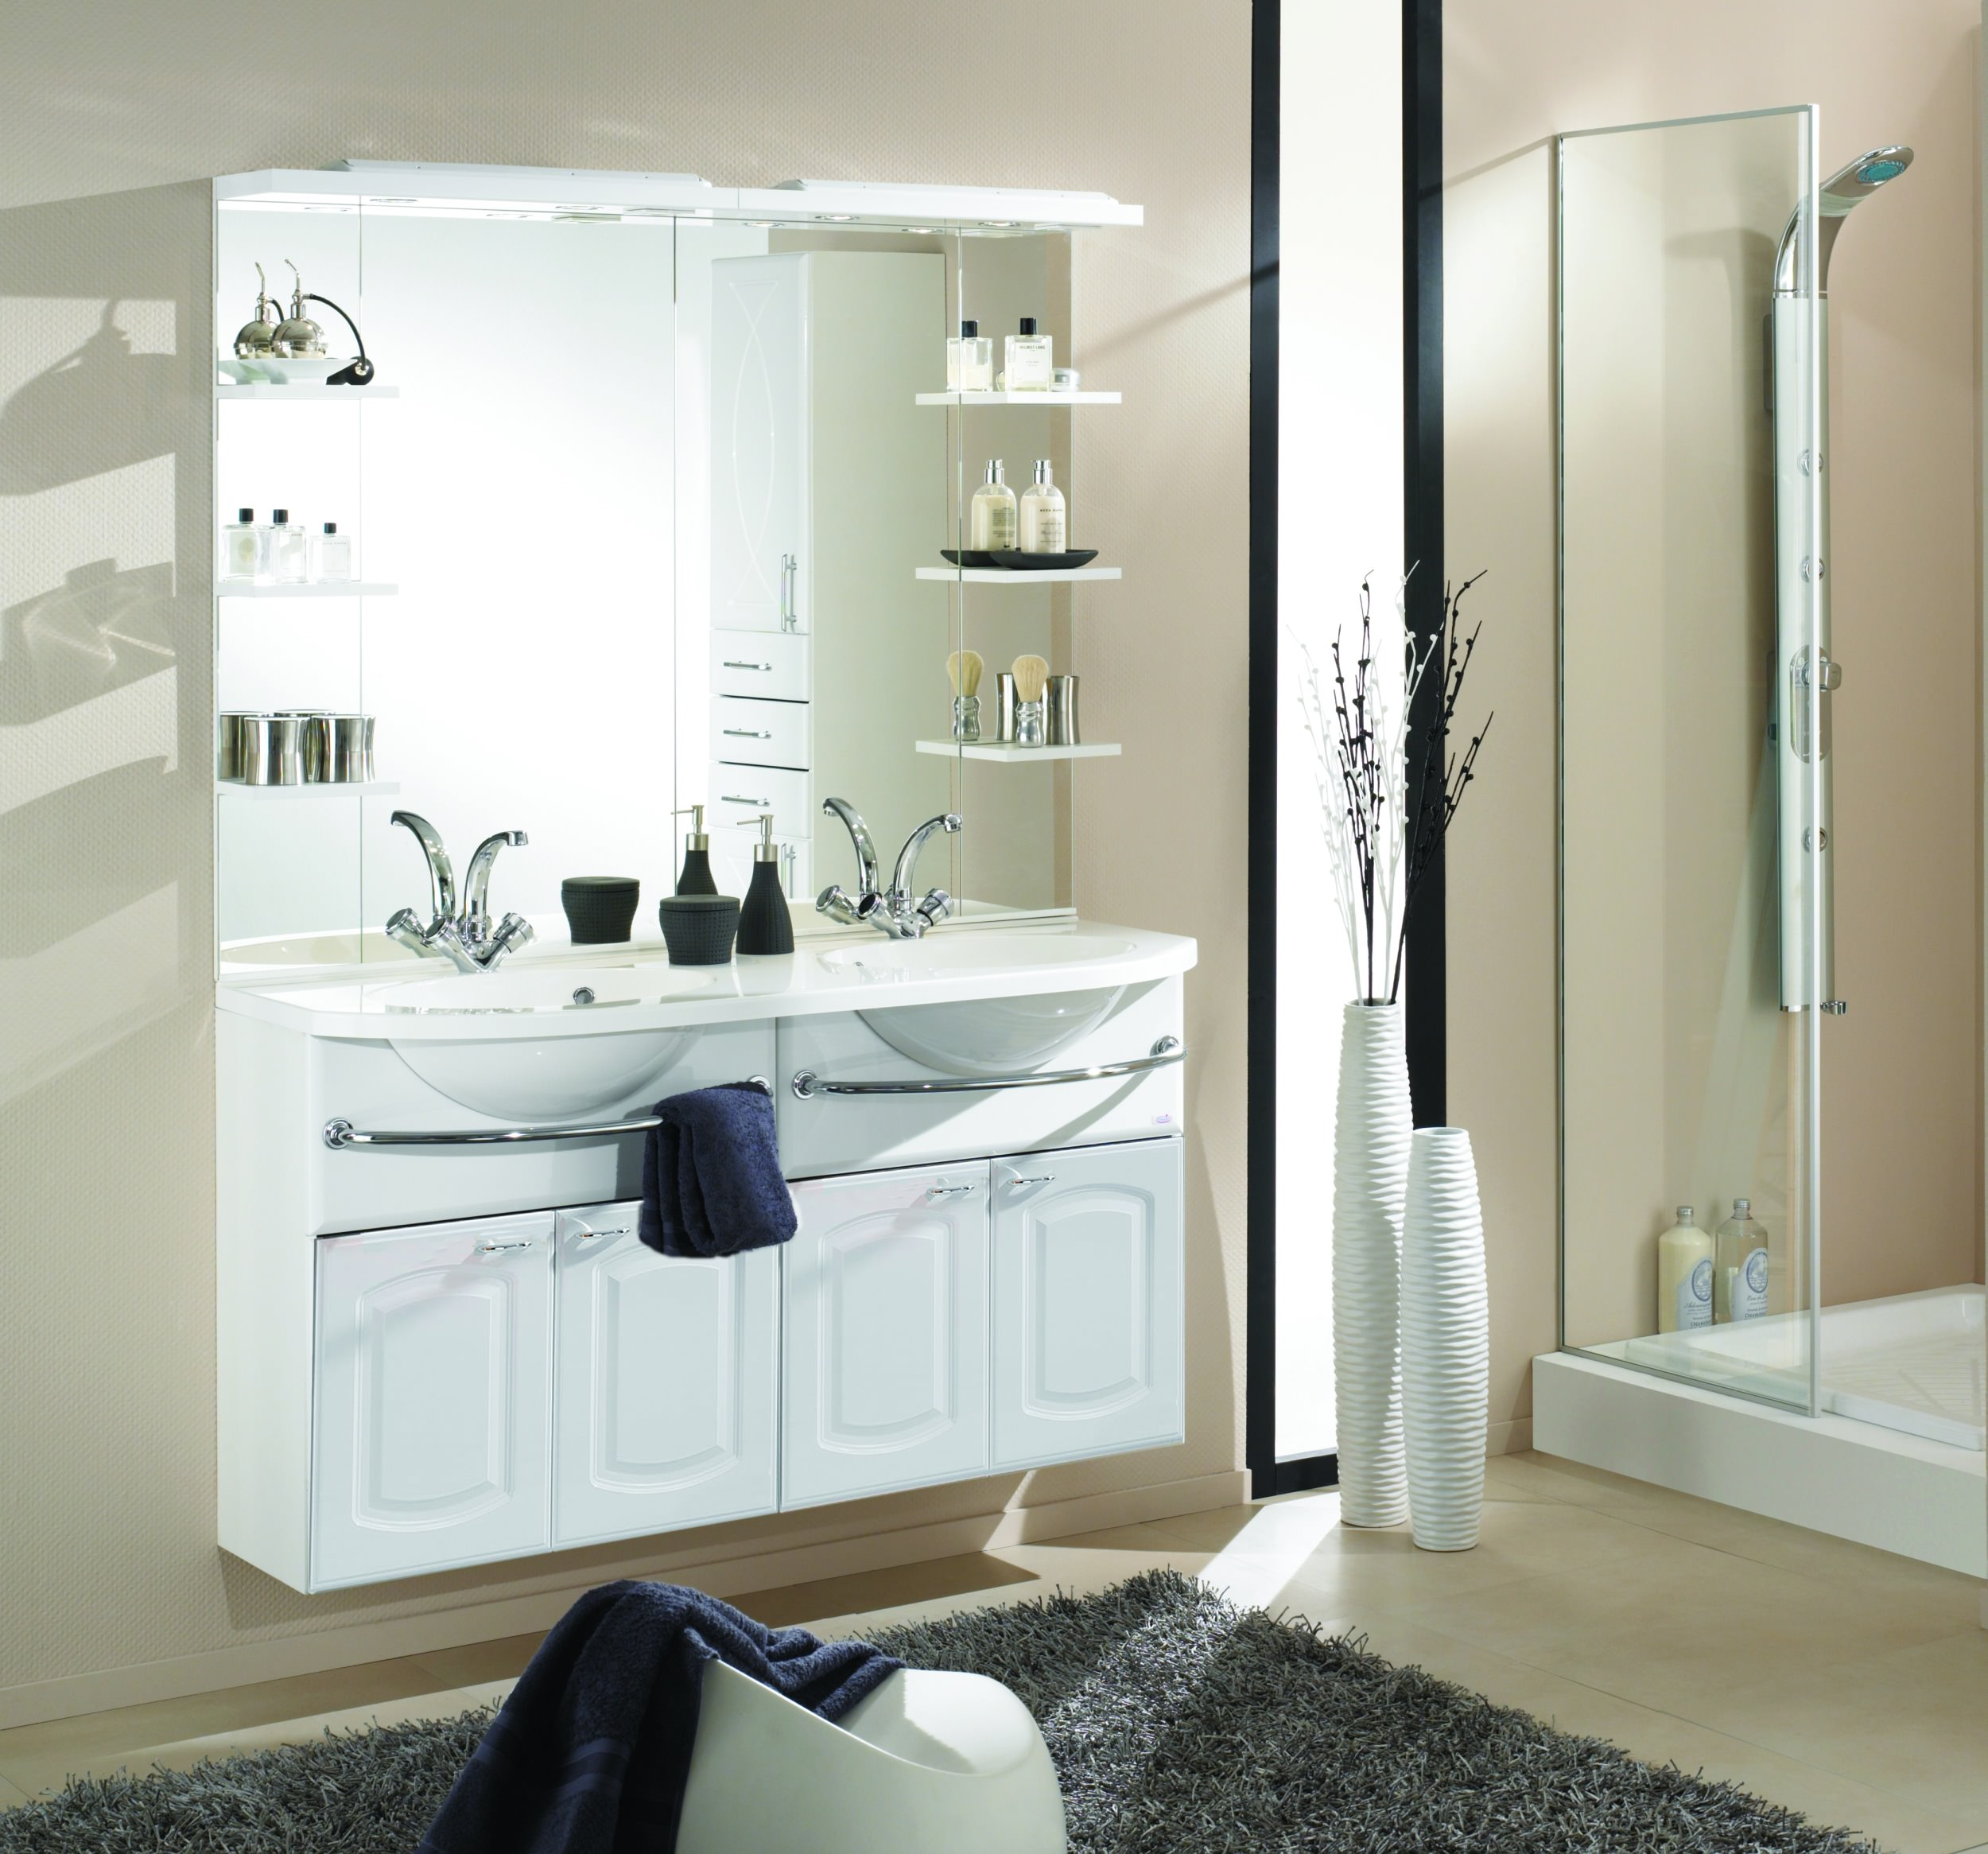 e zoll simply nena badblock 134cm version vd wei miniperl wei hochglanz 29936. Black Bedroom Furniture Sets. Home Design Ideas